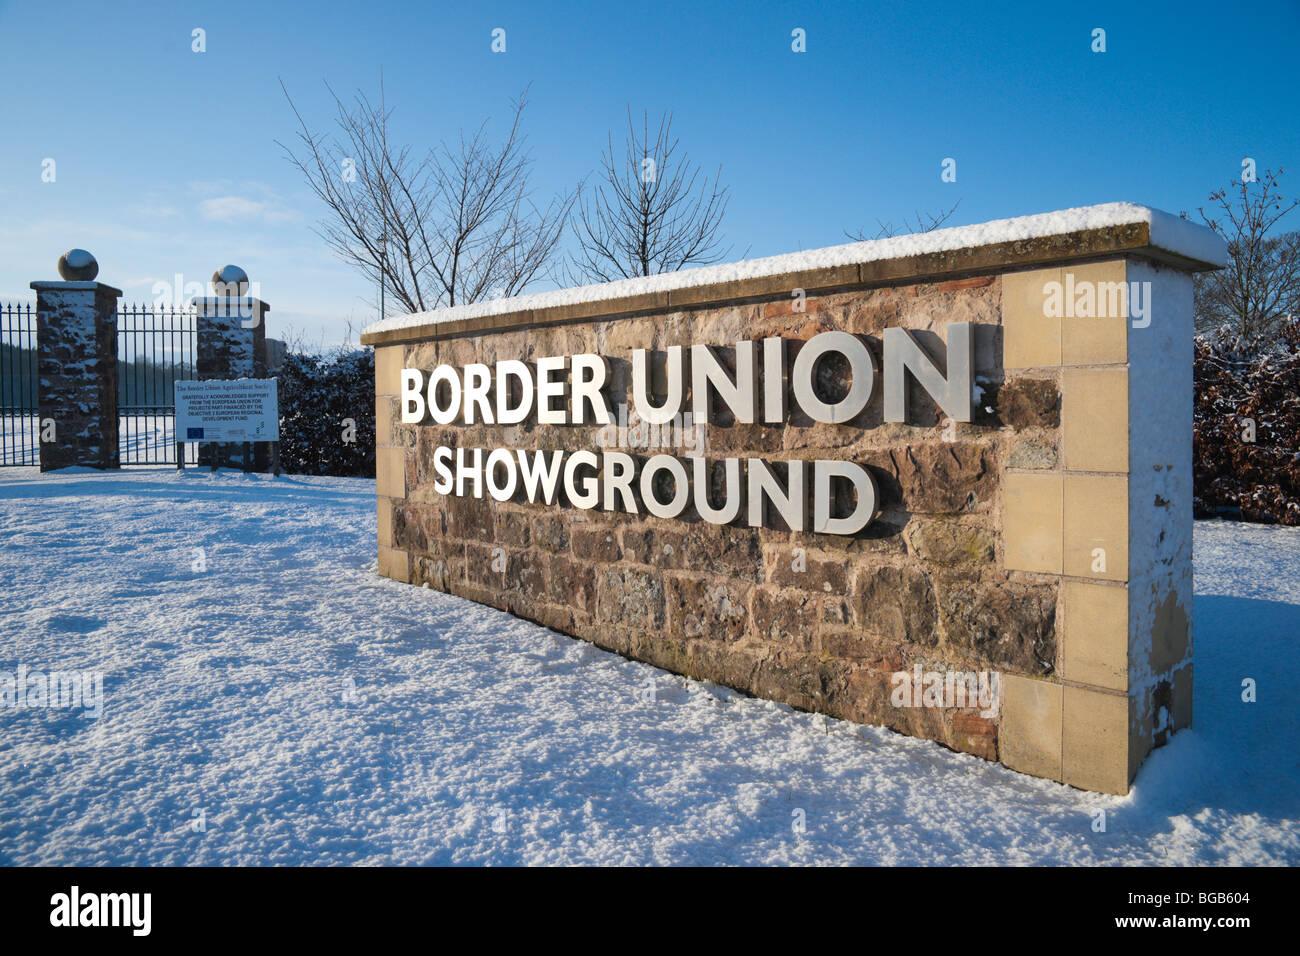 December snow scene Kelso Scottish Borders UK - Border Union showground sign entrance to Springwood Park - Stock Image